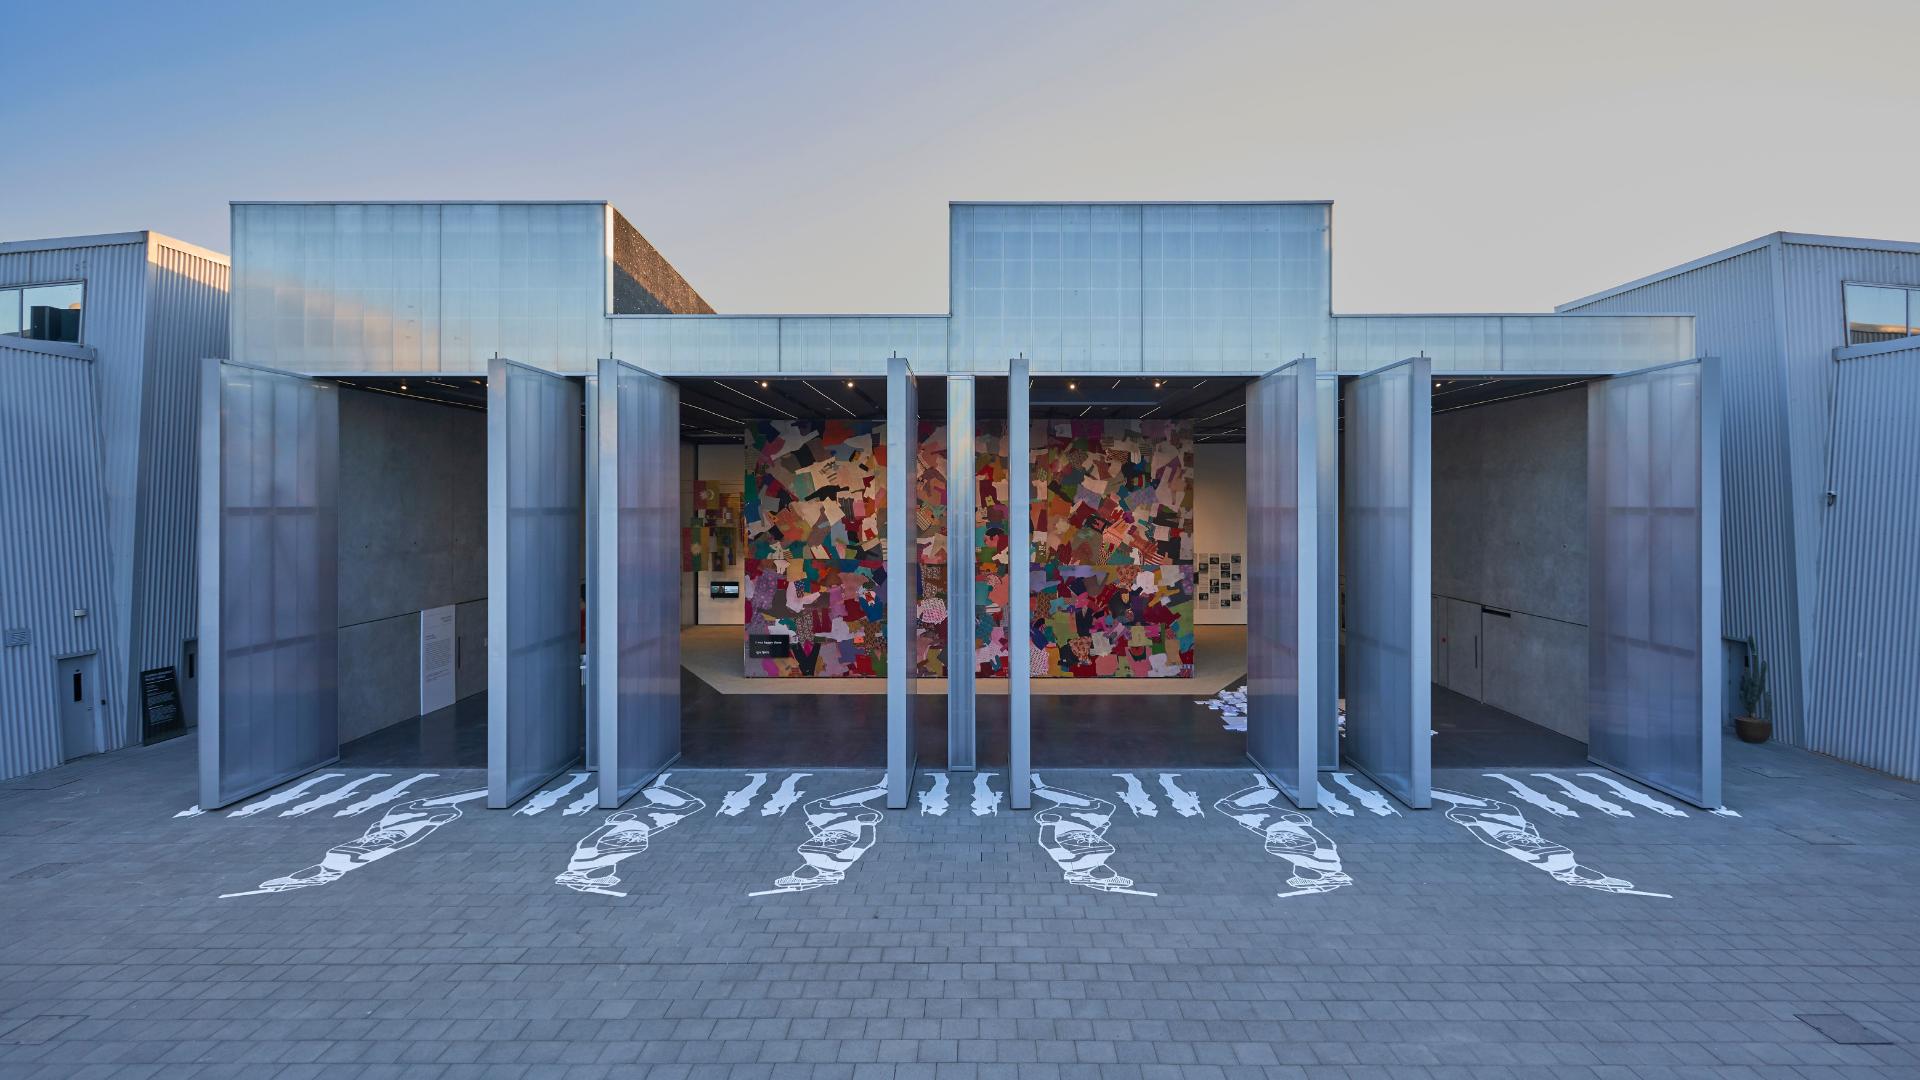 What To Expect From Dubai Art Season 2019